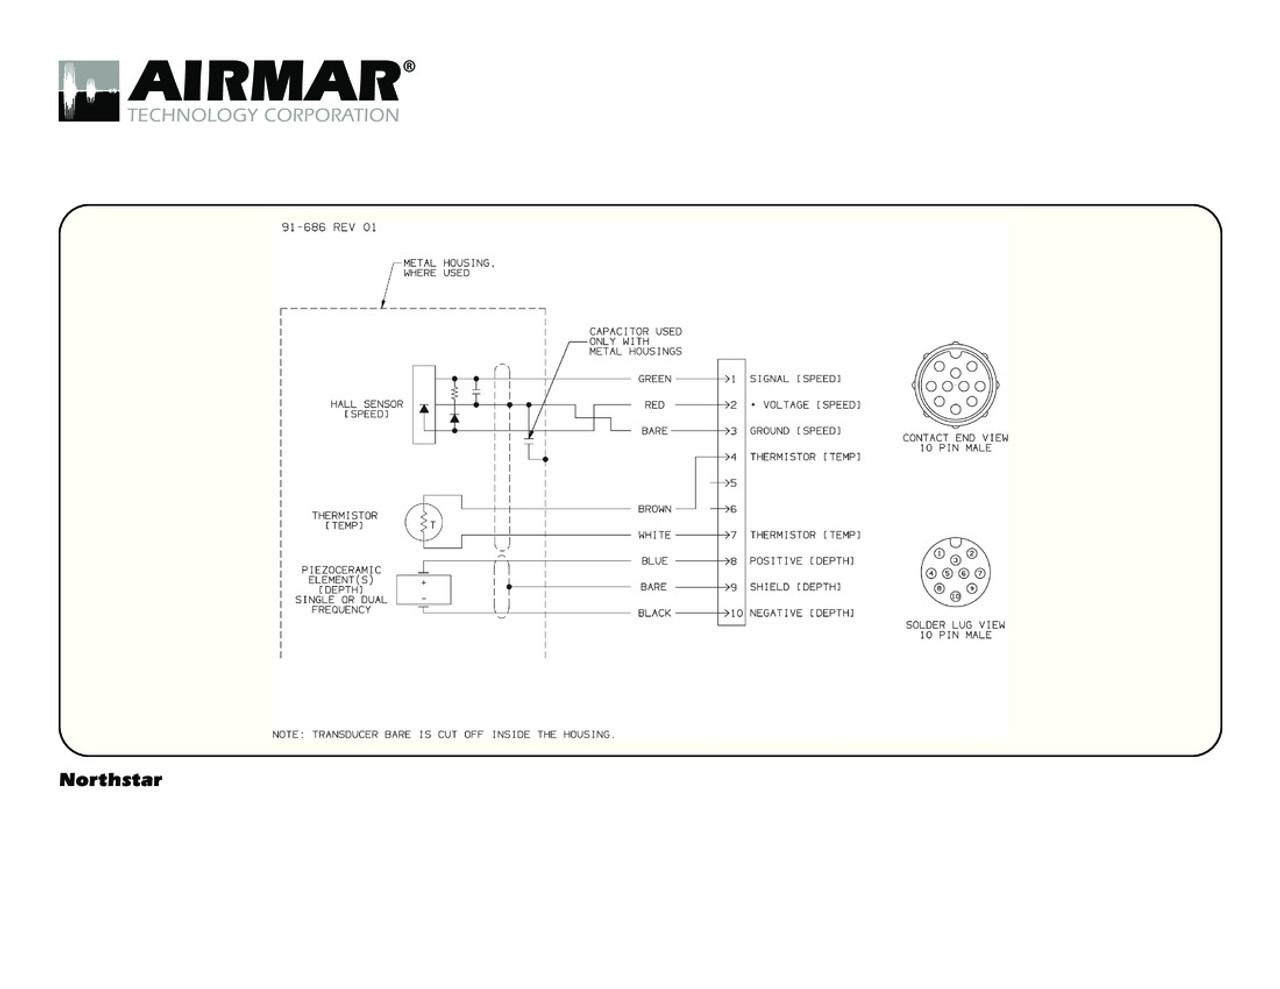 small resolution of garmin 4 pinwiring diagram wiring diagram schemagps 4 pin wiring diagram wiring diagram data schema garmin